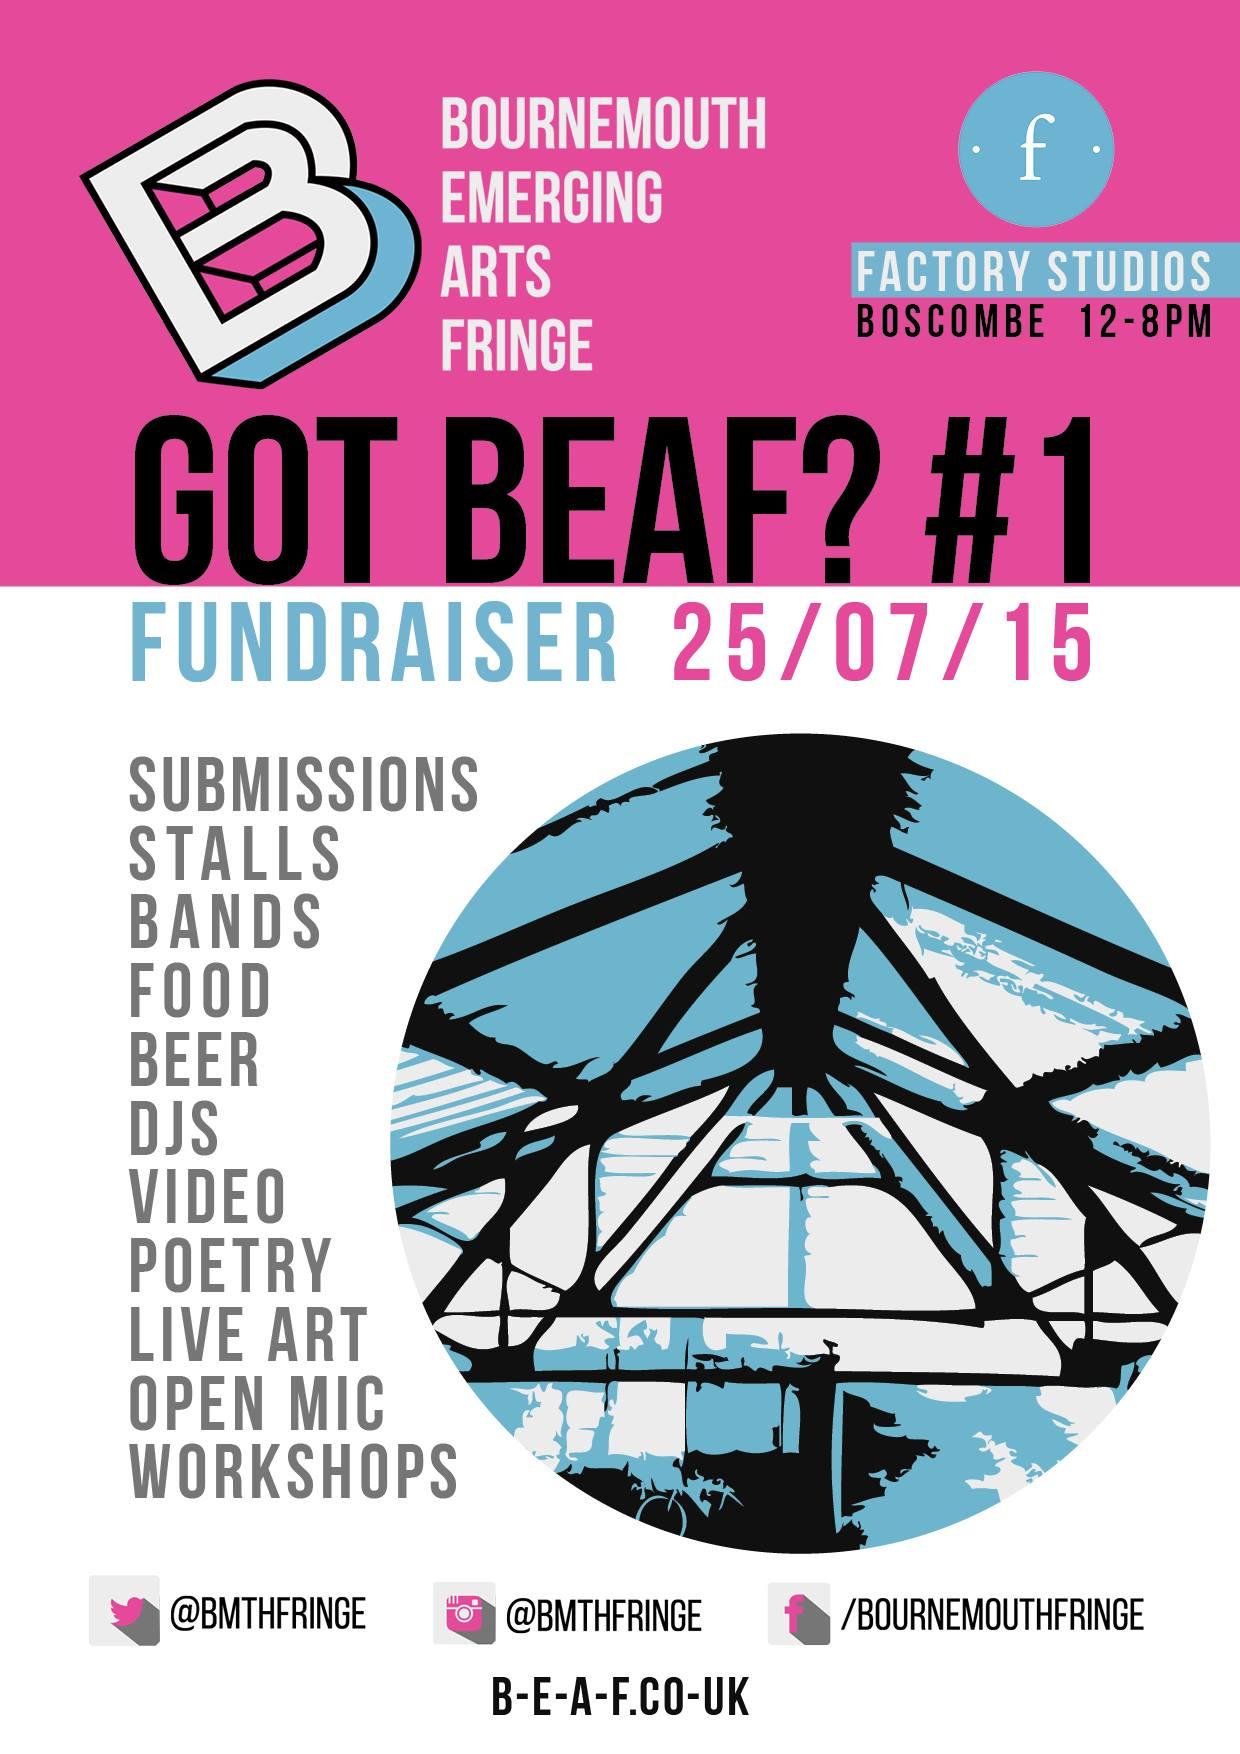 Bournemouth Emerging Arts Fringe - Got Beaf? #1 Fundraiser